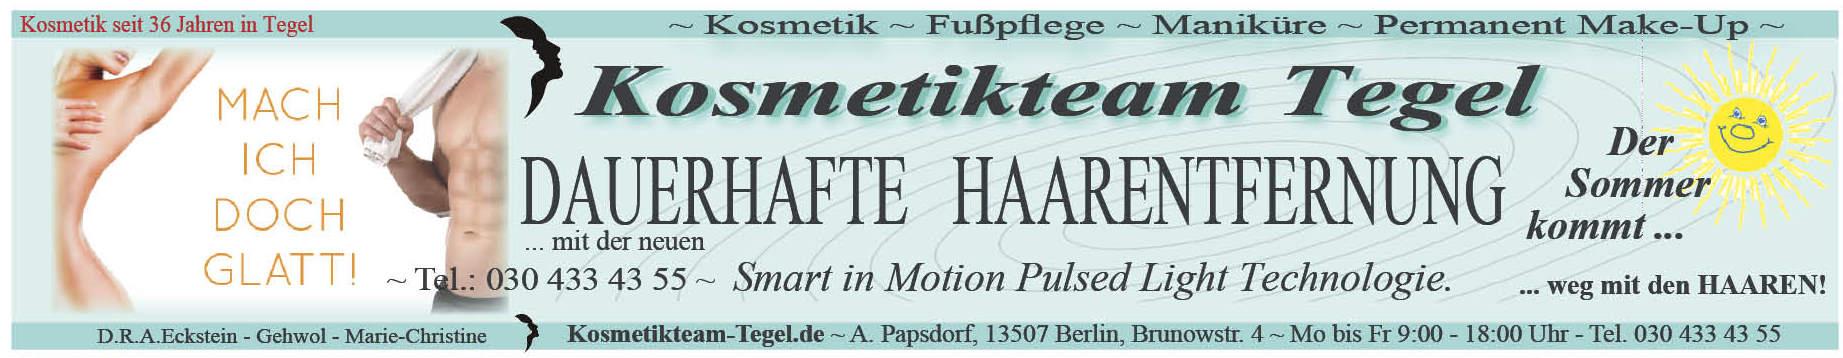 135 wp 06 Papsdorf